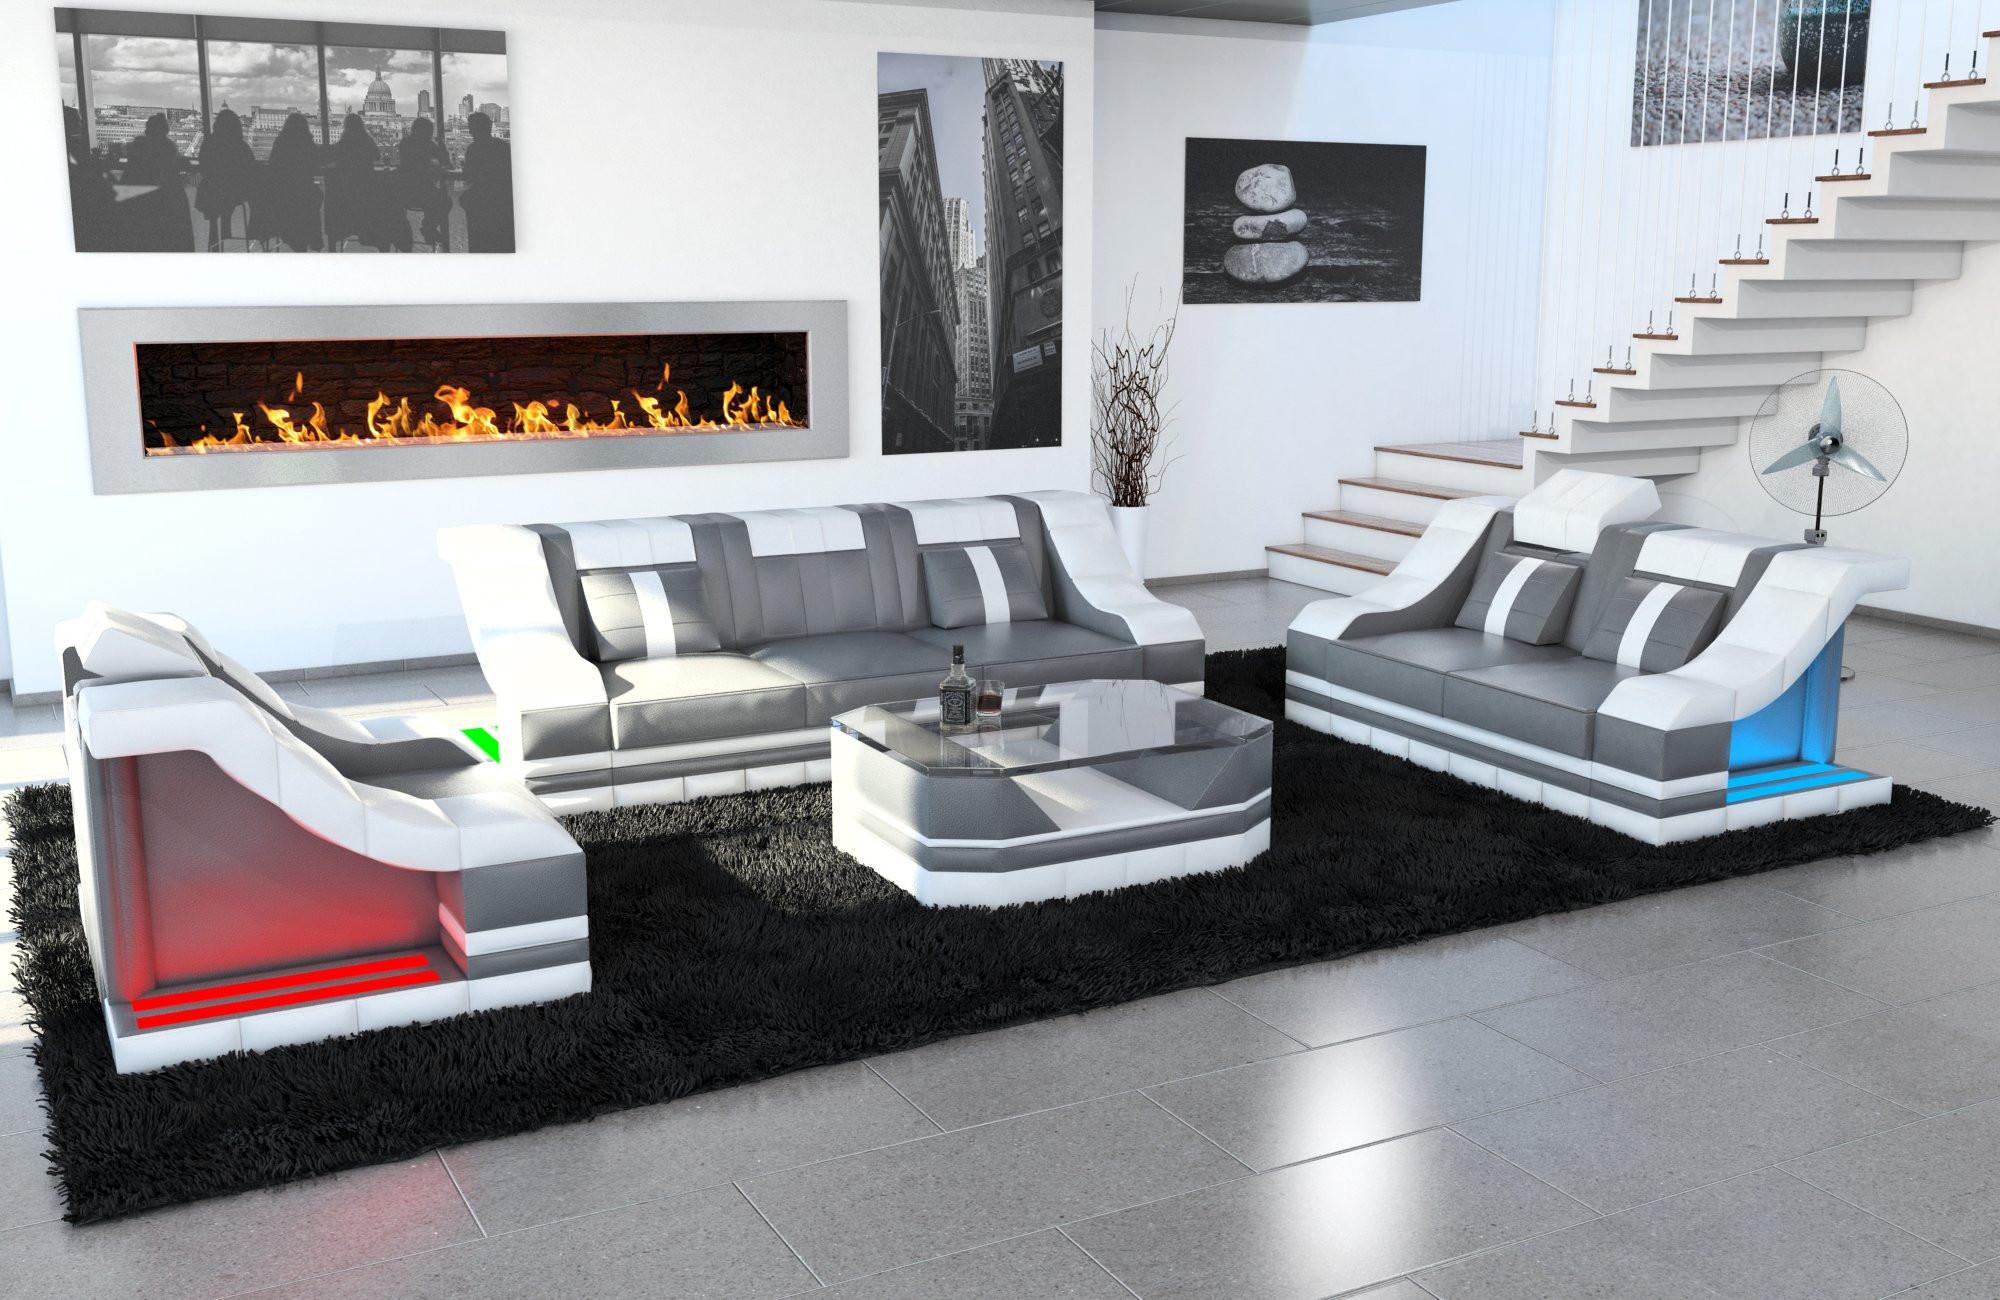 Design Sofa Set New York 3-2-1 in grey-white